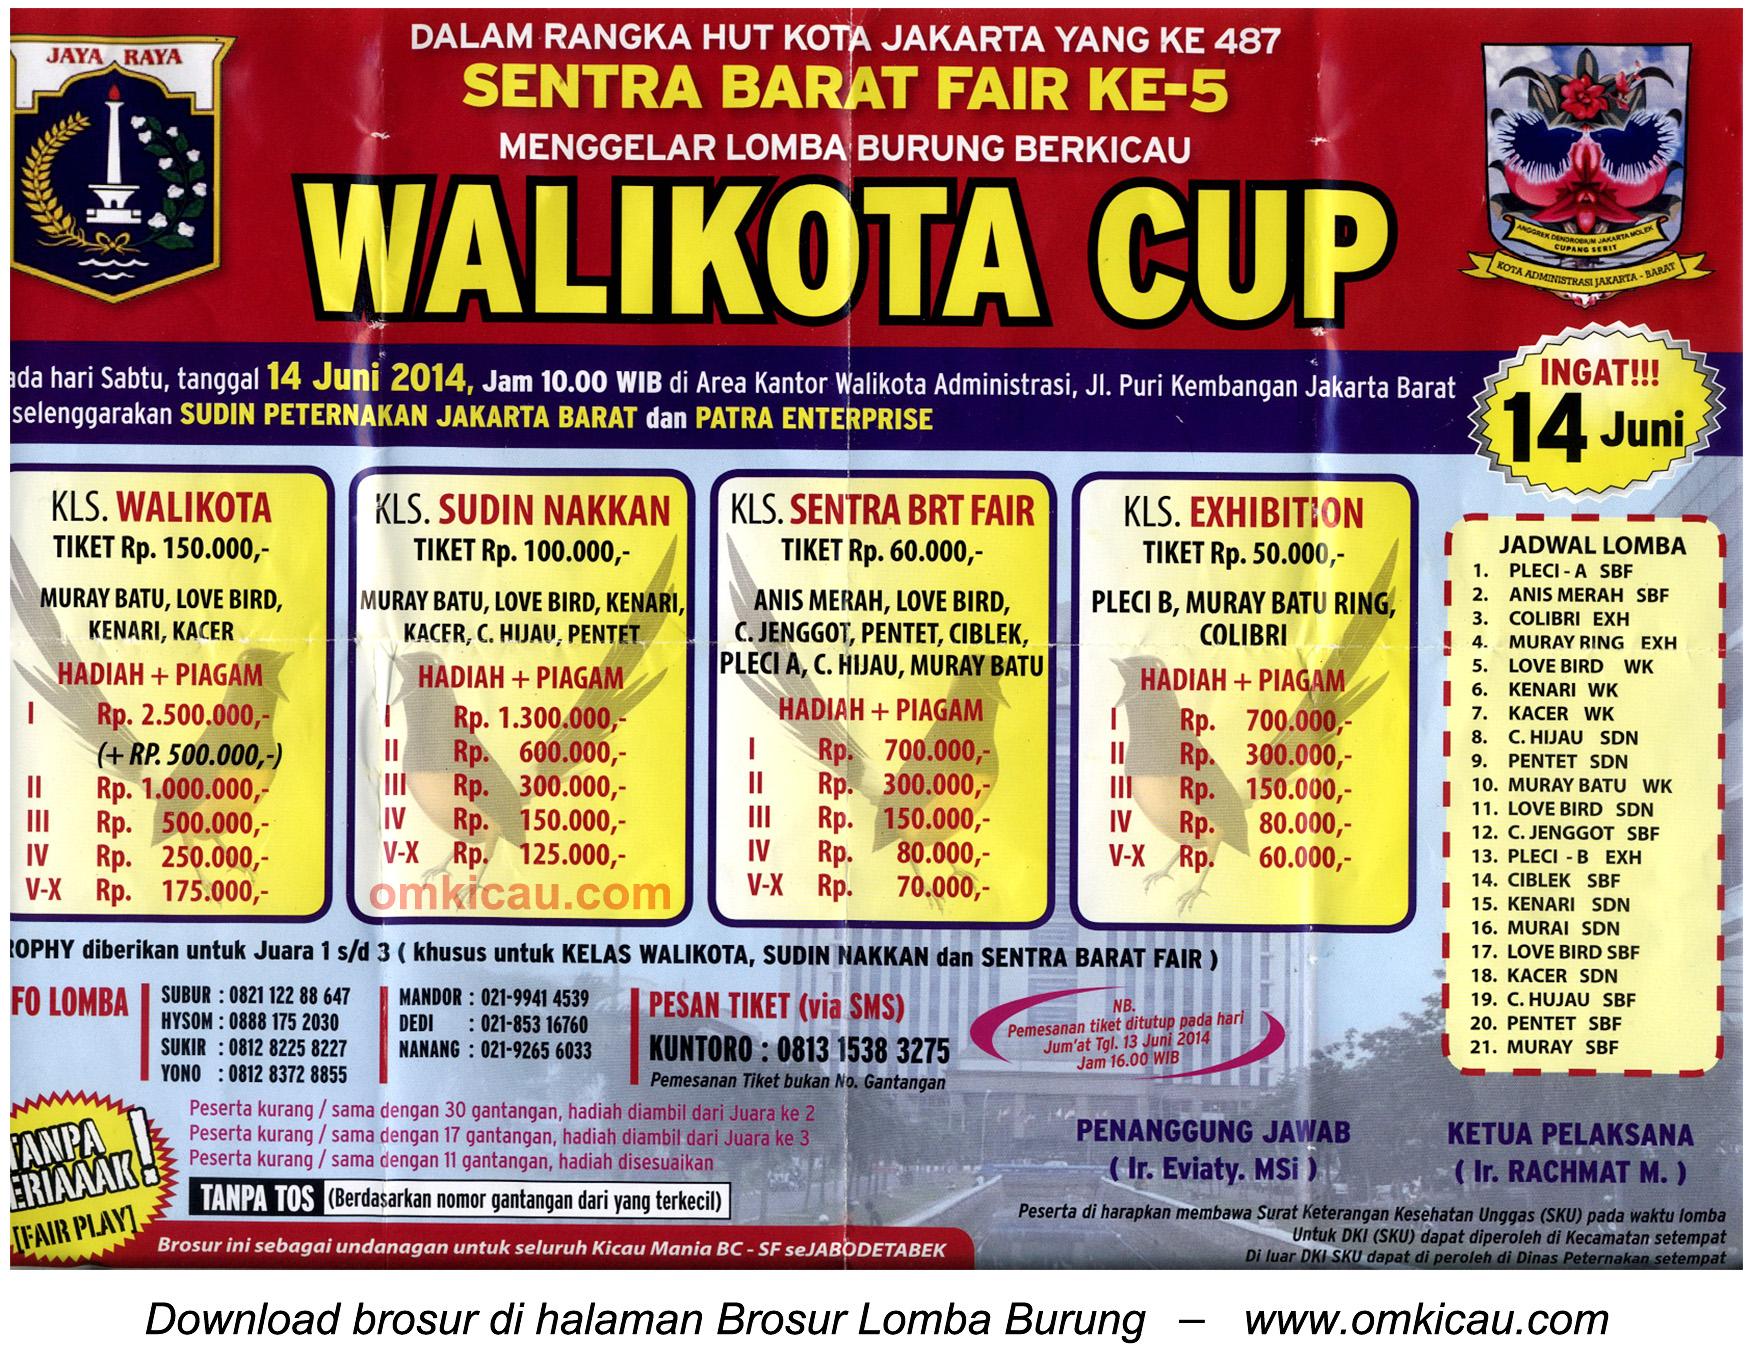 Brosur Lomba Burung Berkicau Wali Kota Cup Jakarta Barat, 14 Juni 2014